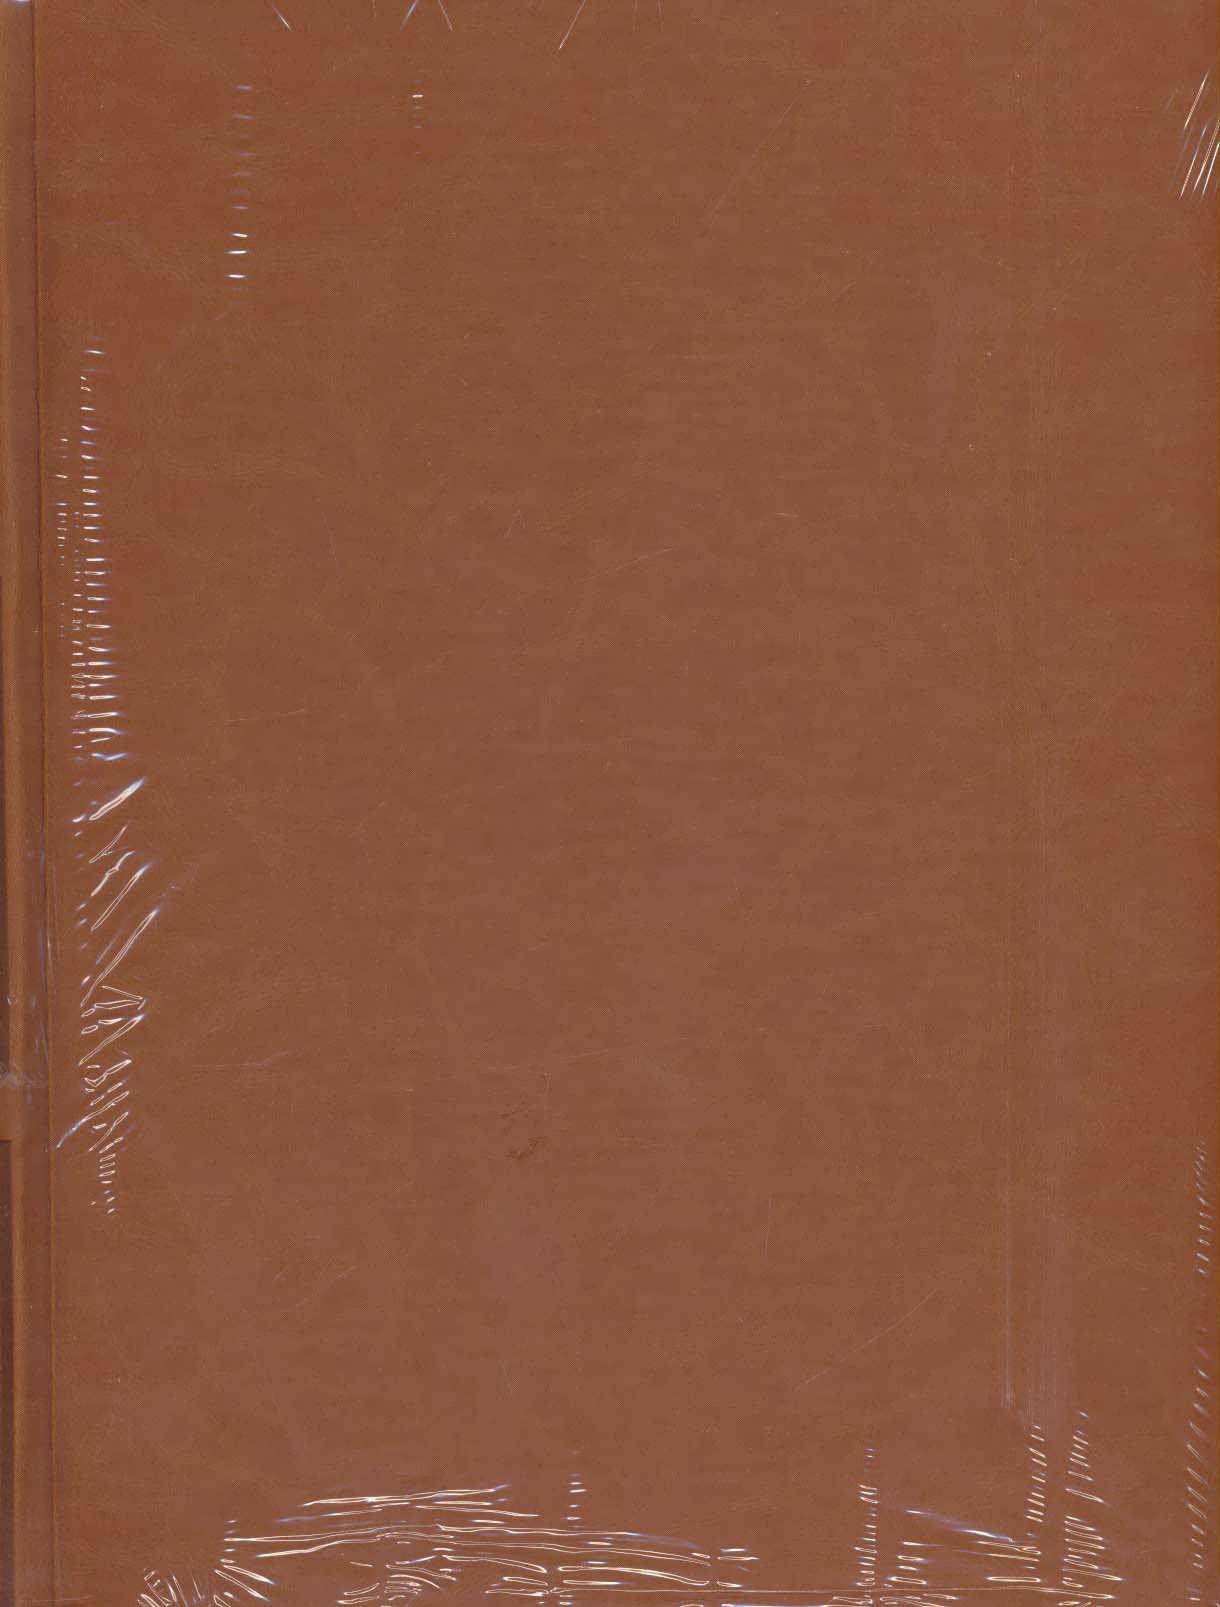 کلیات مفاتیح الجنان (5رنگ،معطر،گلاسه،باجعبه،چرم،لب طلایی)